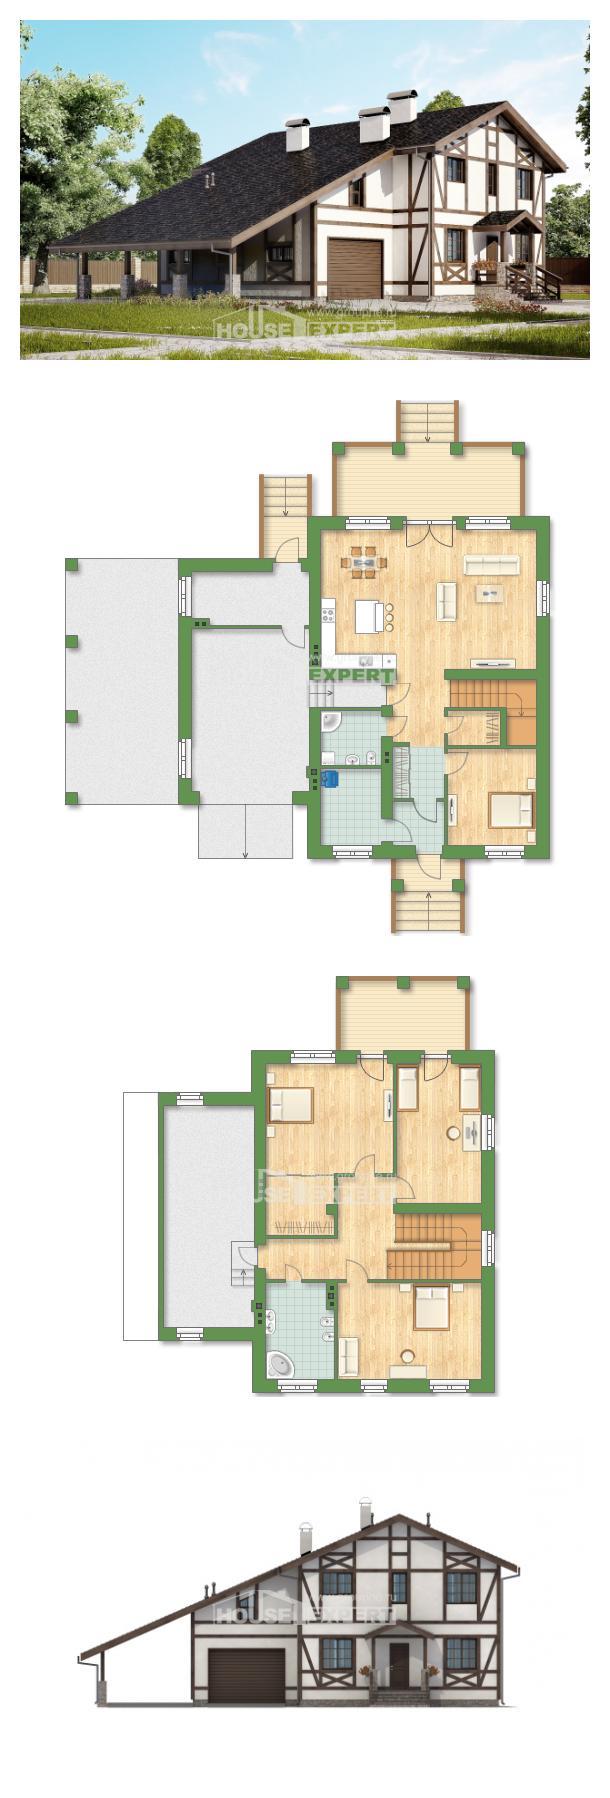 Проект дома 250-002-Л   House Expert